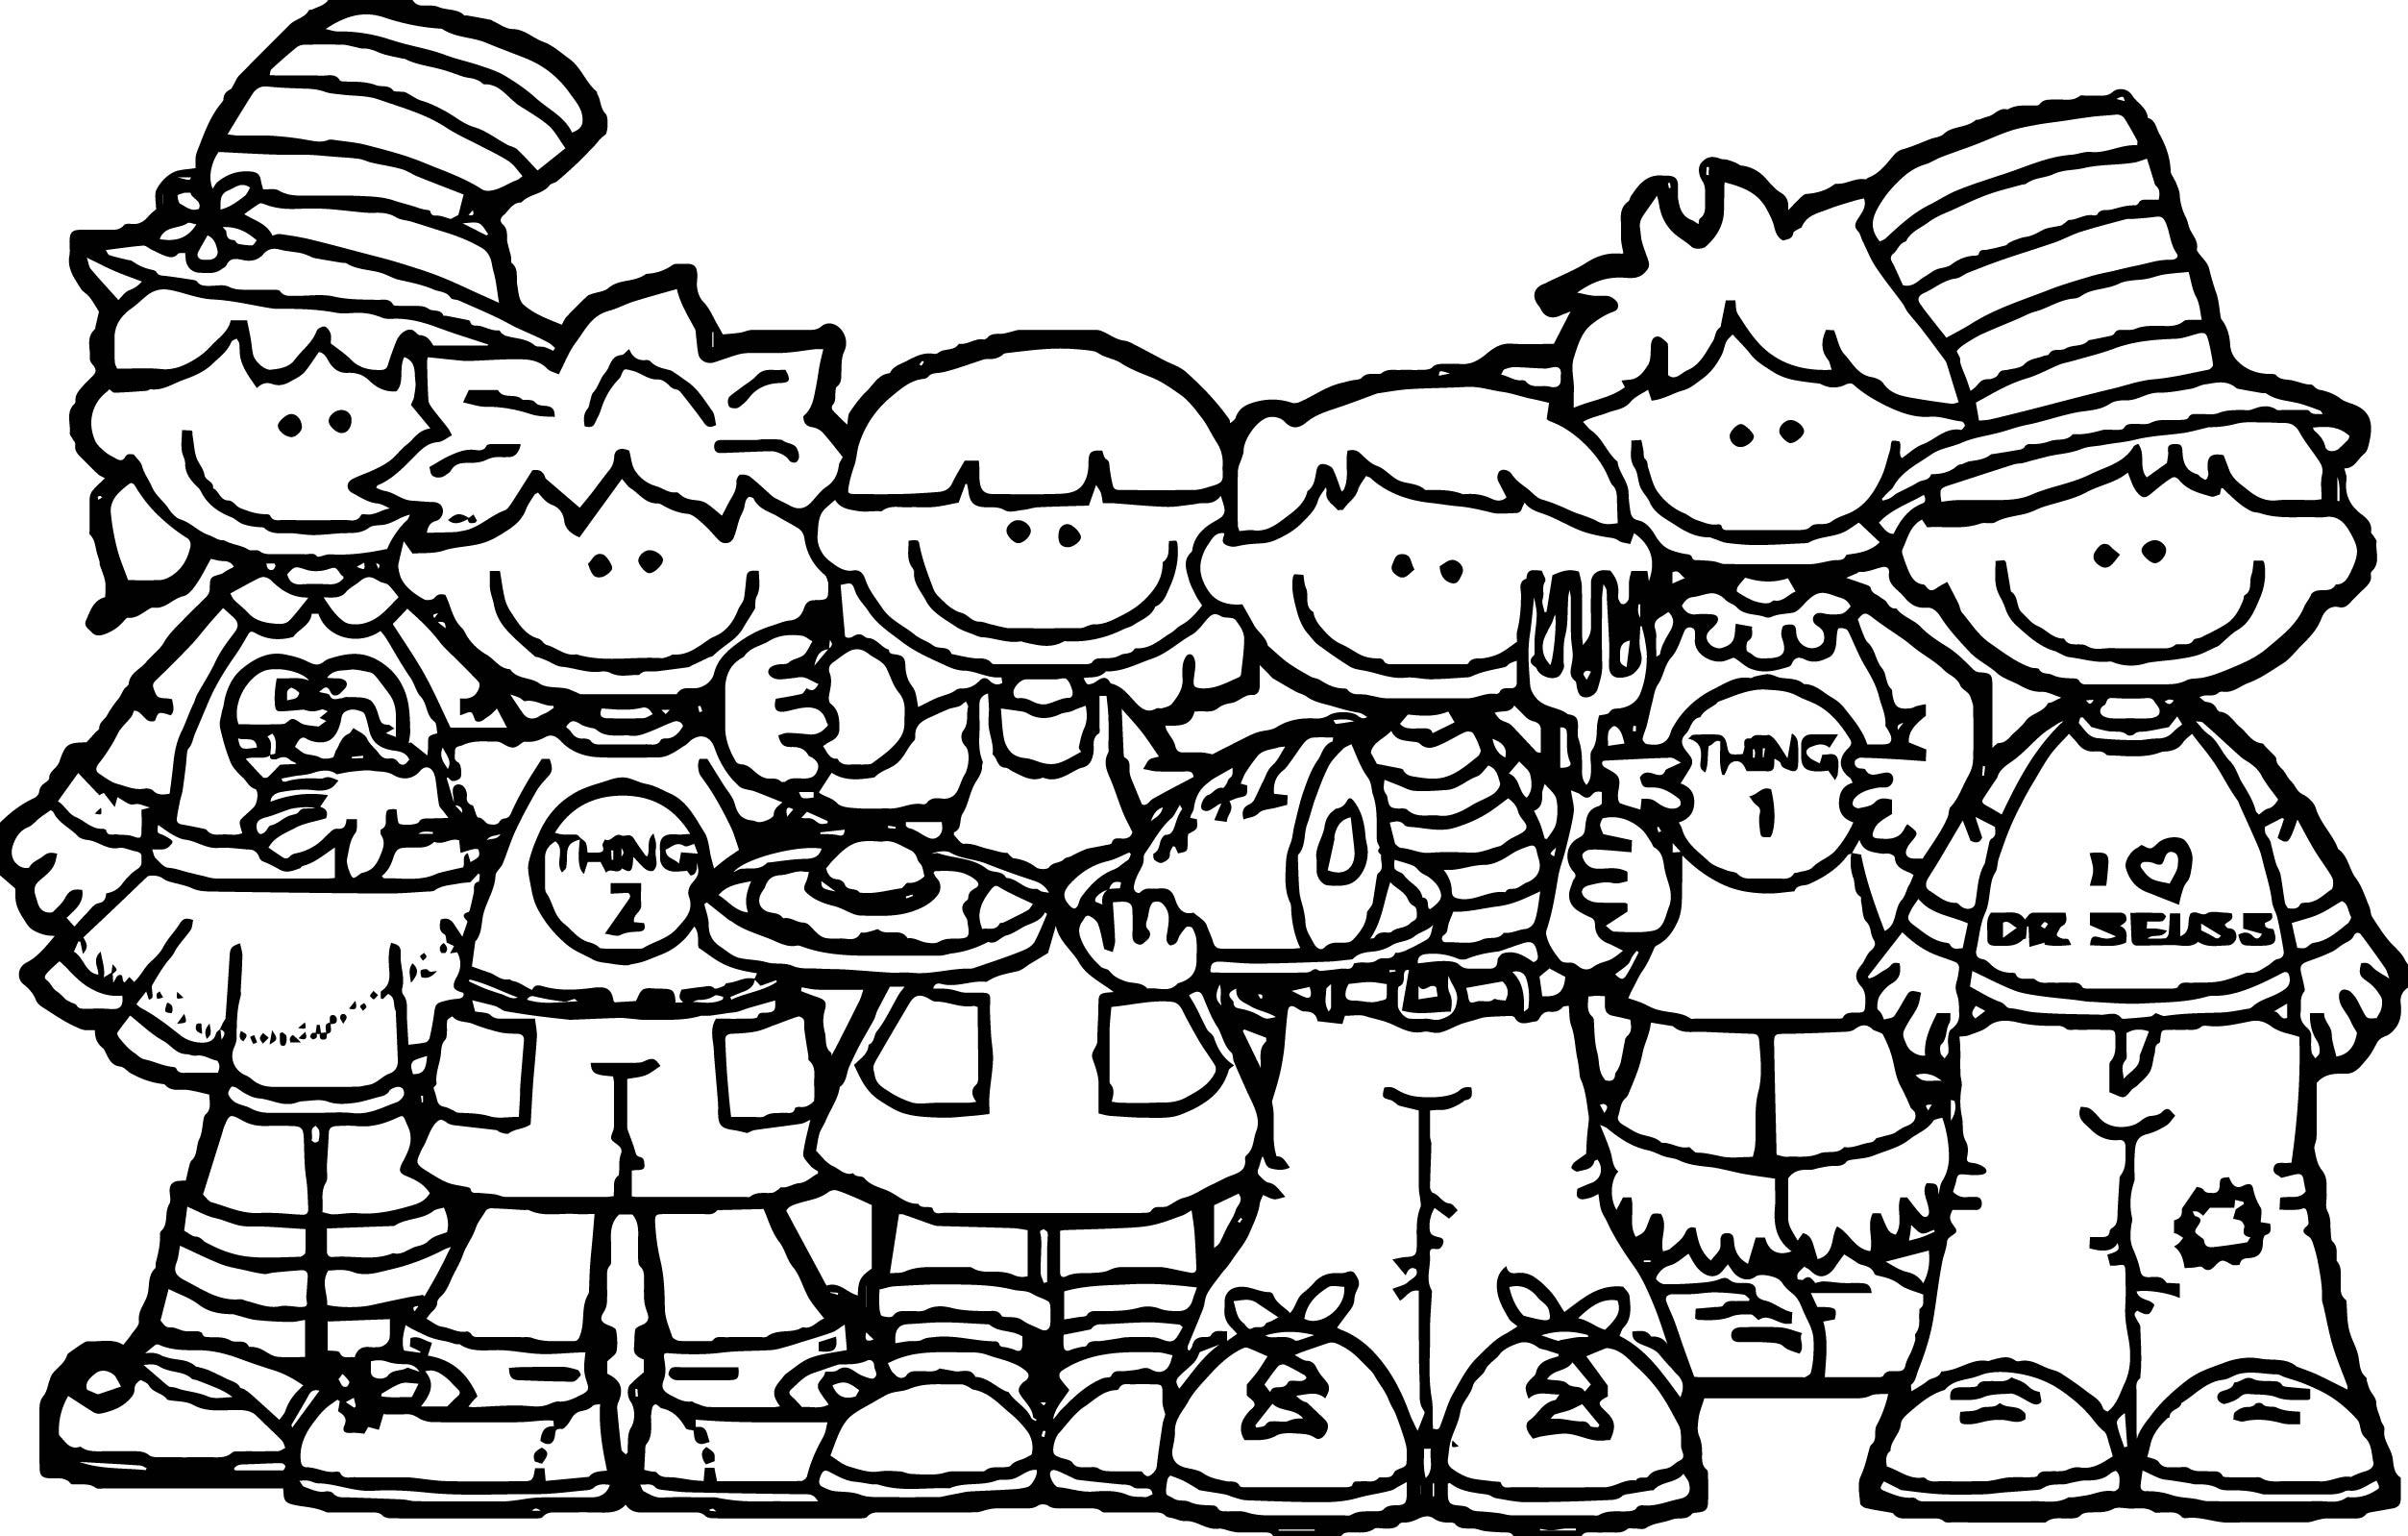 Seuss Kids 3rd Grade Coloring Page